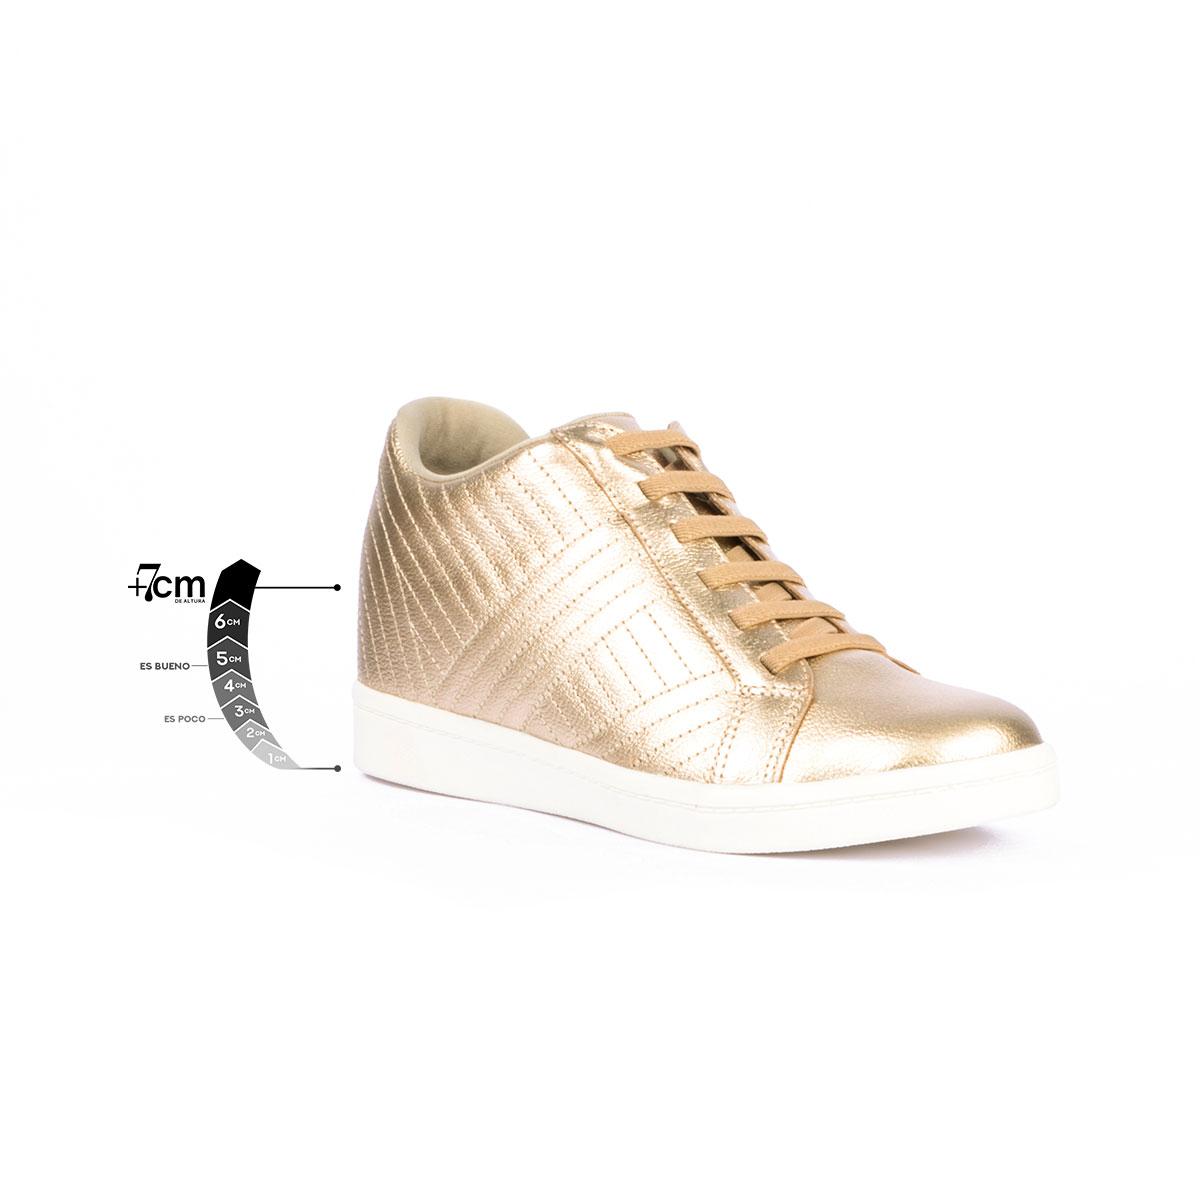 Tenis Casual Boulevard Oro Max Denegri + 7cms de Altura_76394